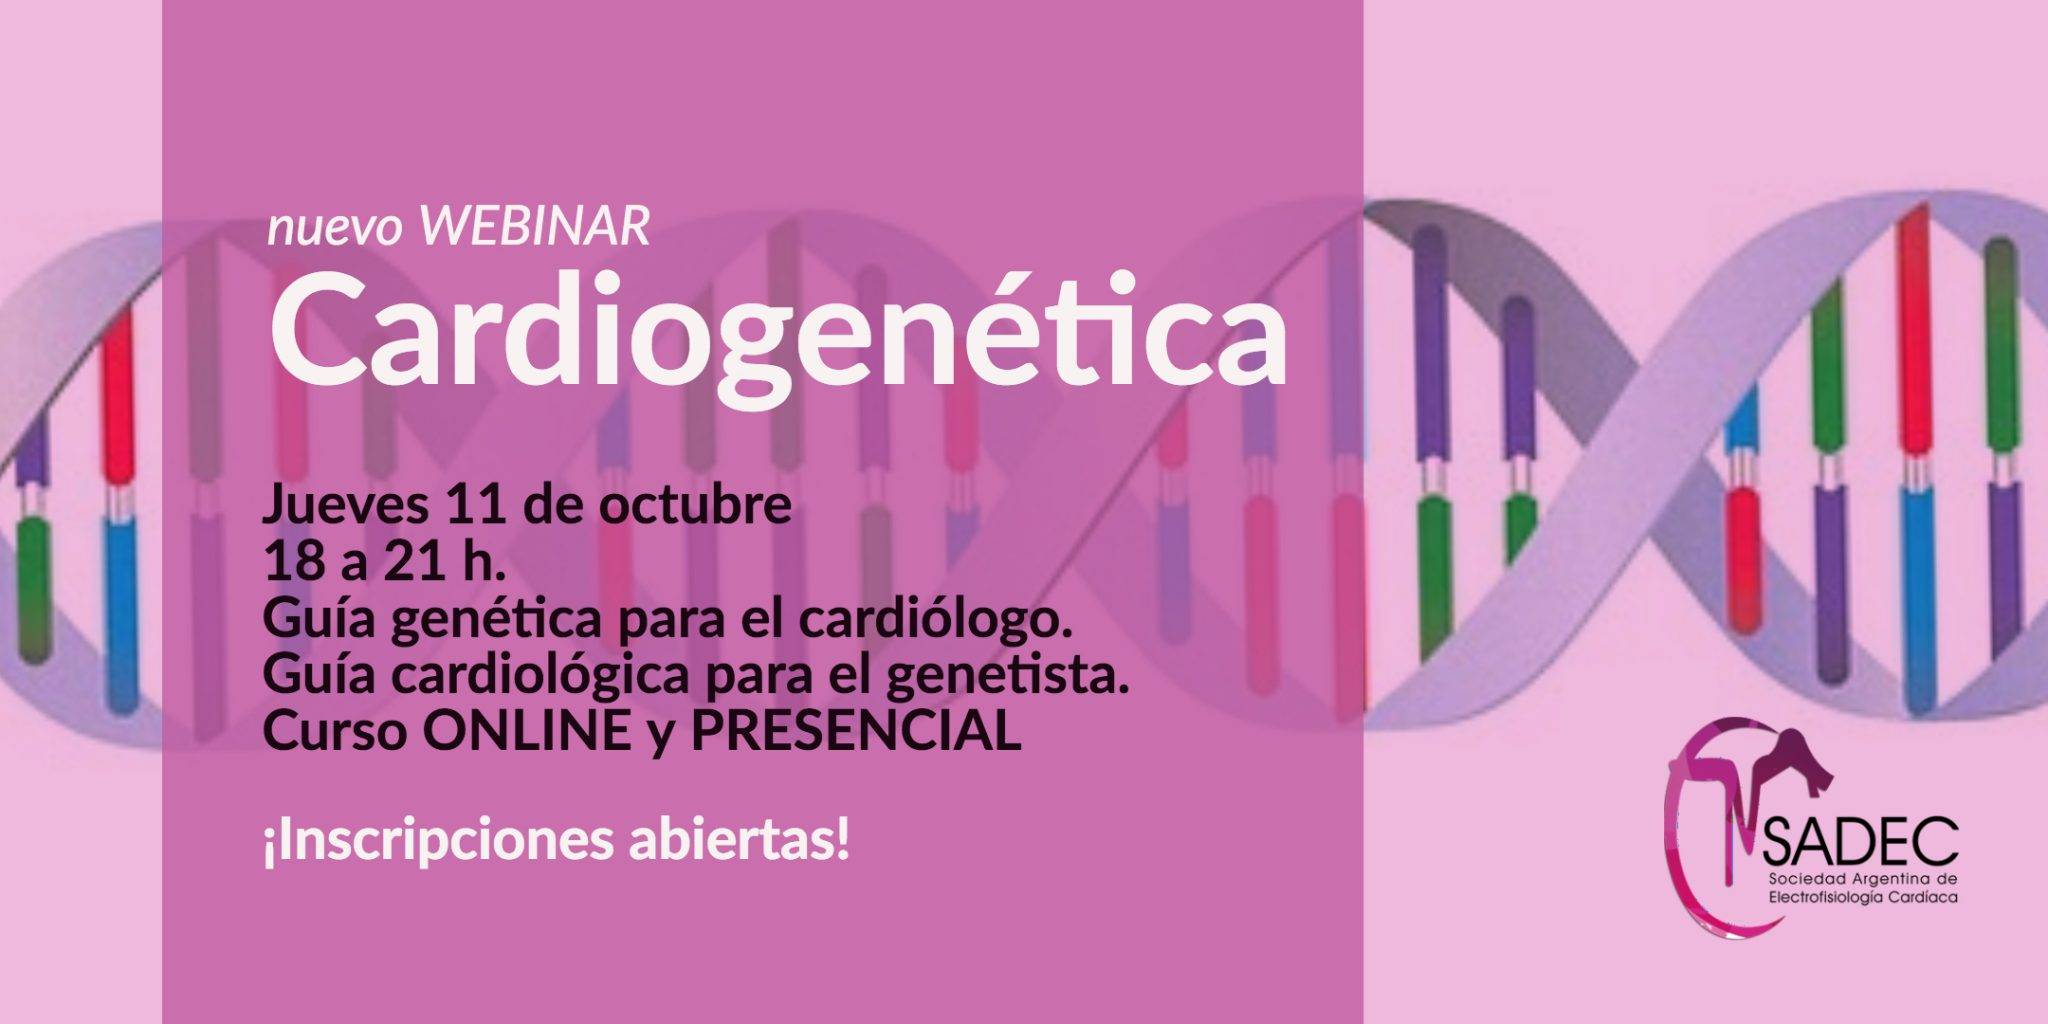 Curso de Cardiogenetica